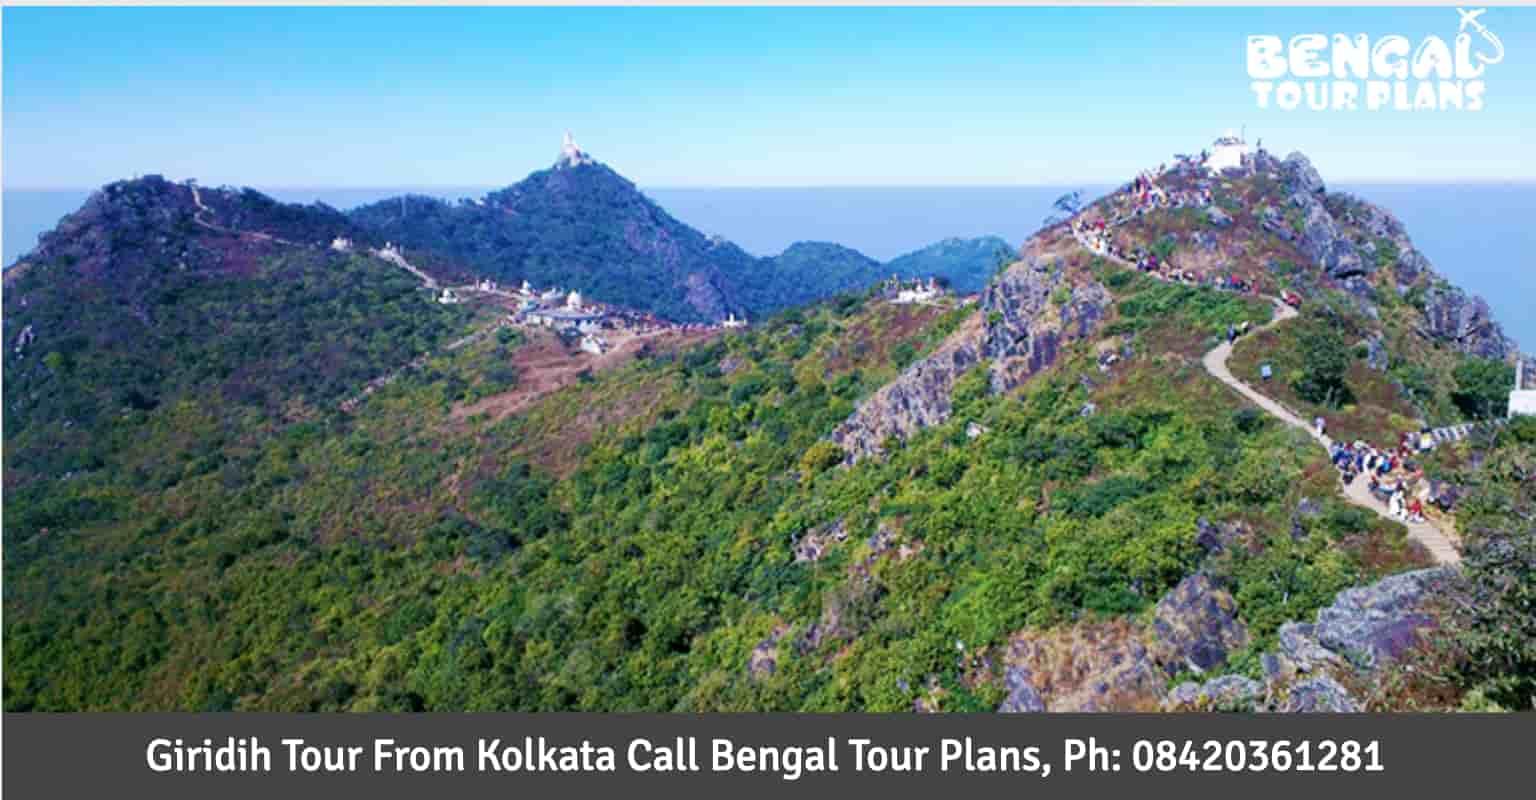 Giridih Tour From Kolkata